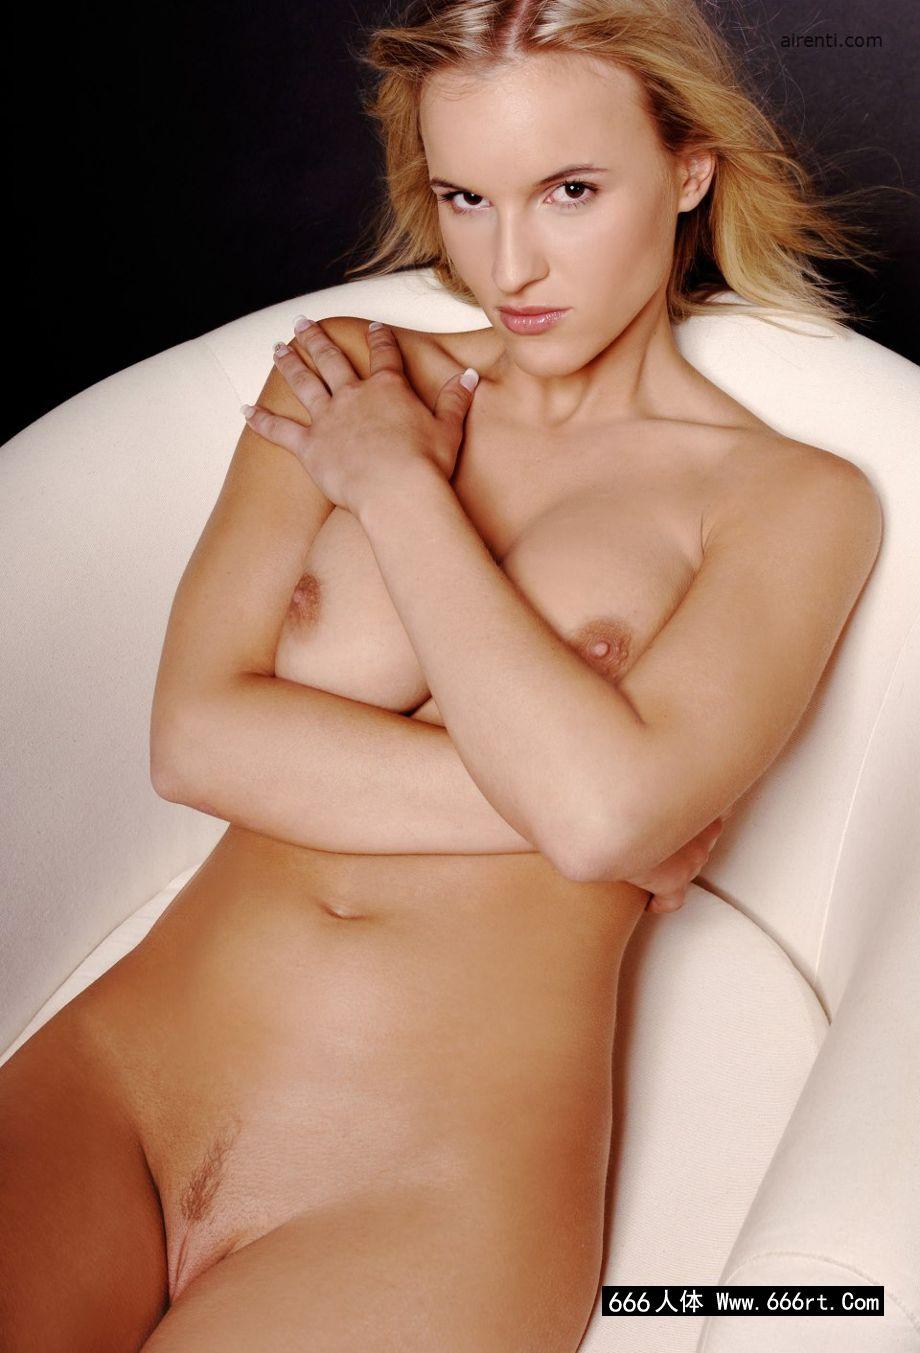 gogo韩国人体高清人体艺术,欧美男人眼中的御姐波莉浴缸中摄影